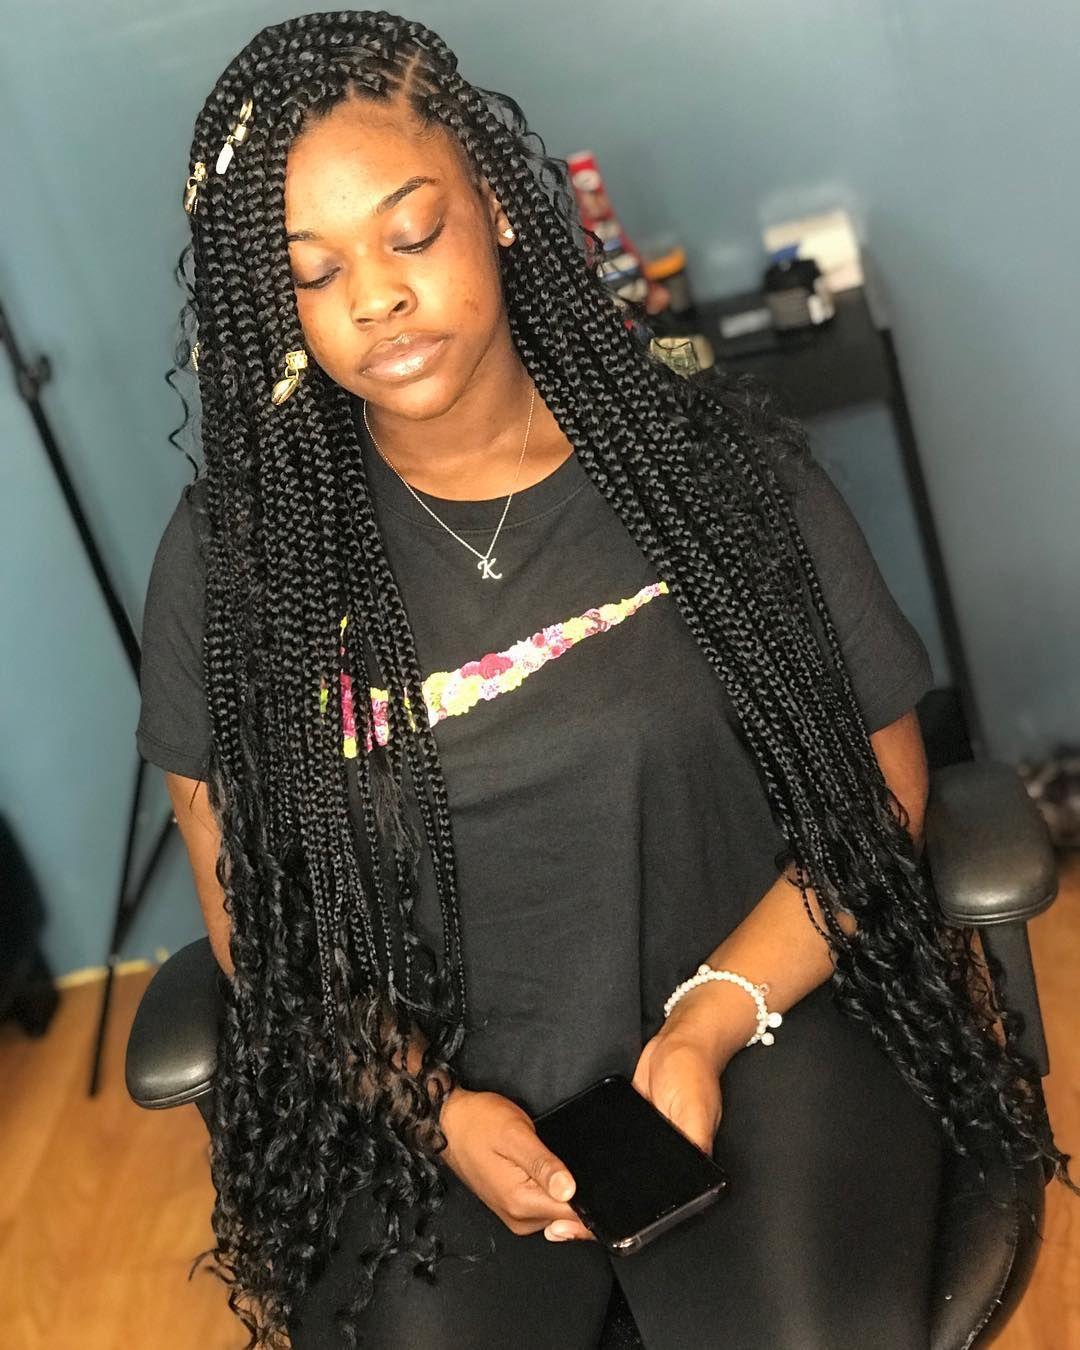 Come Get Fleeked On Instagram Goddess Box Braids 1 Braider Hair Provided Price L Braided Hairstyles Braids With Curls Braided Hairstyles Easy